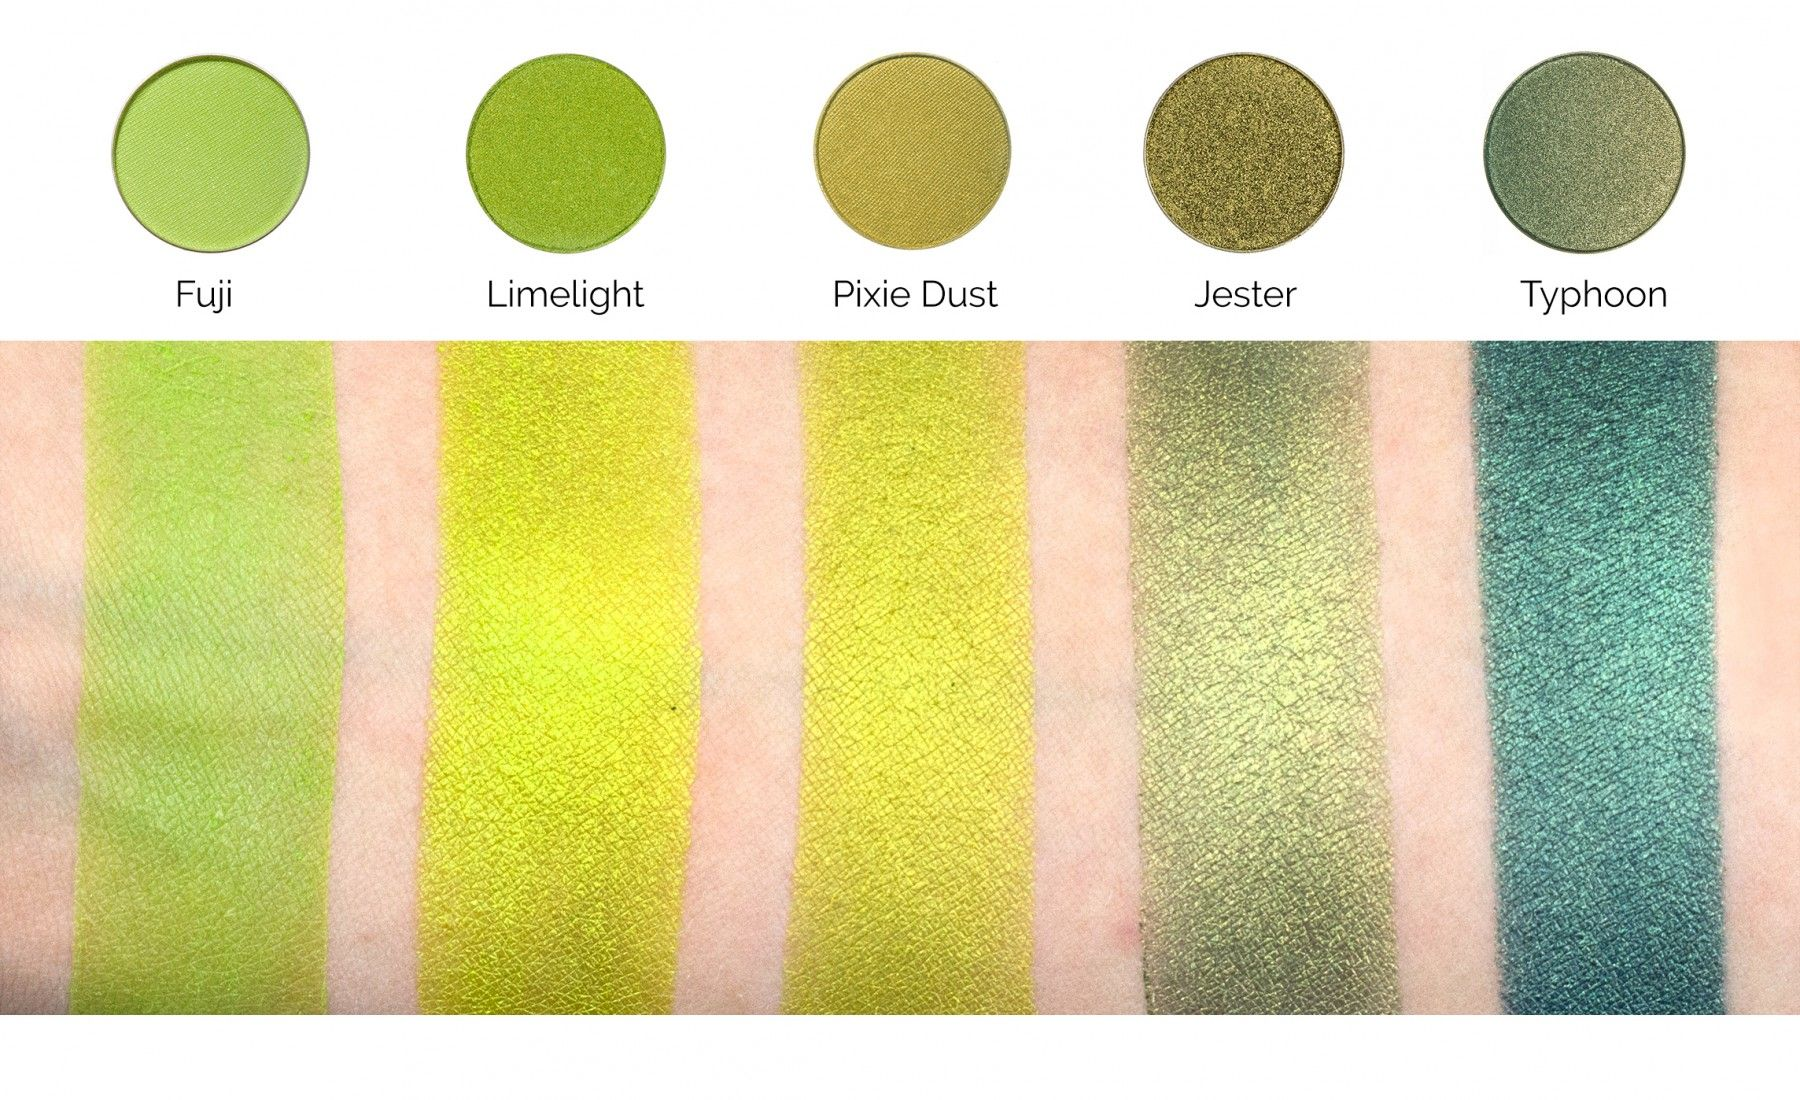 Pin On Skincare And Makeup